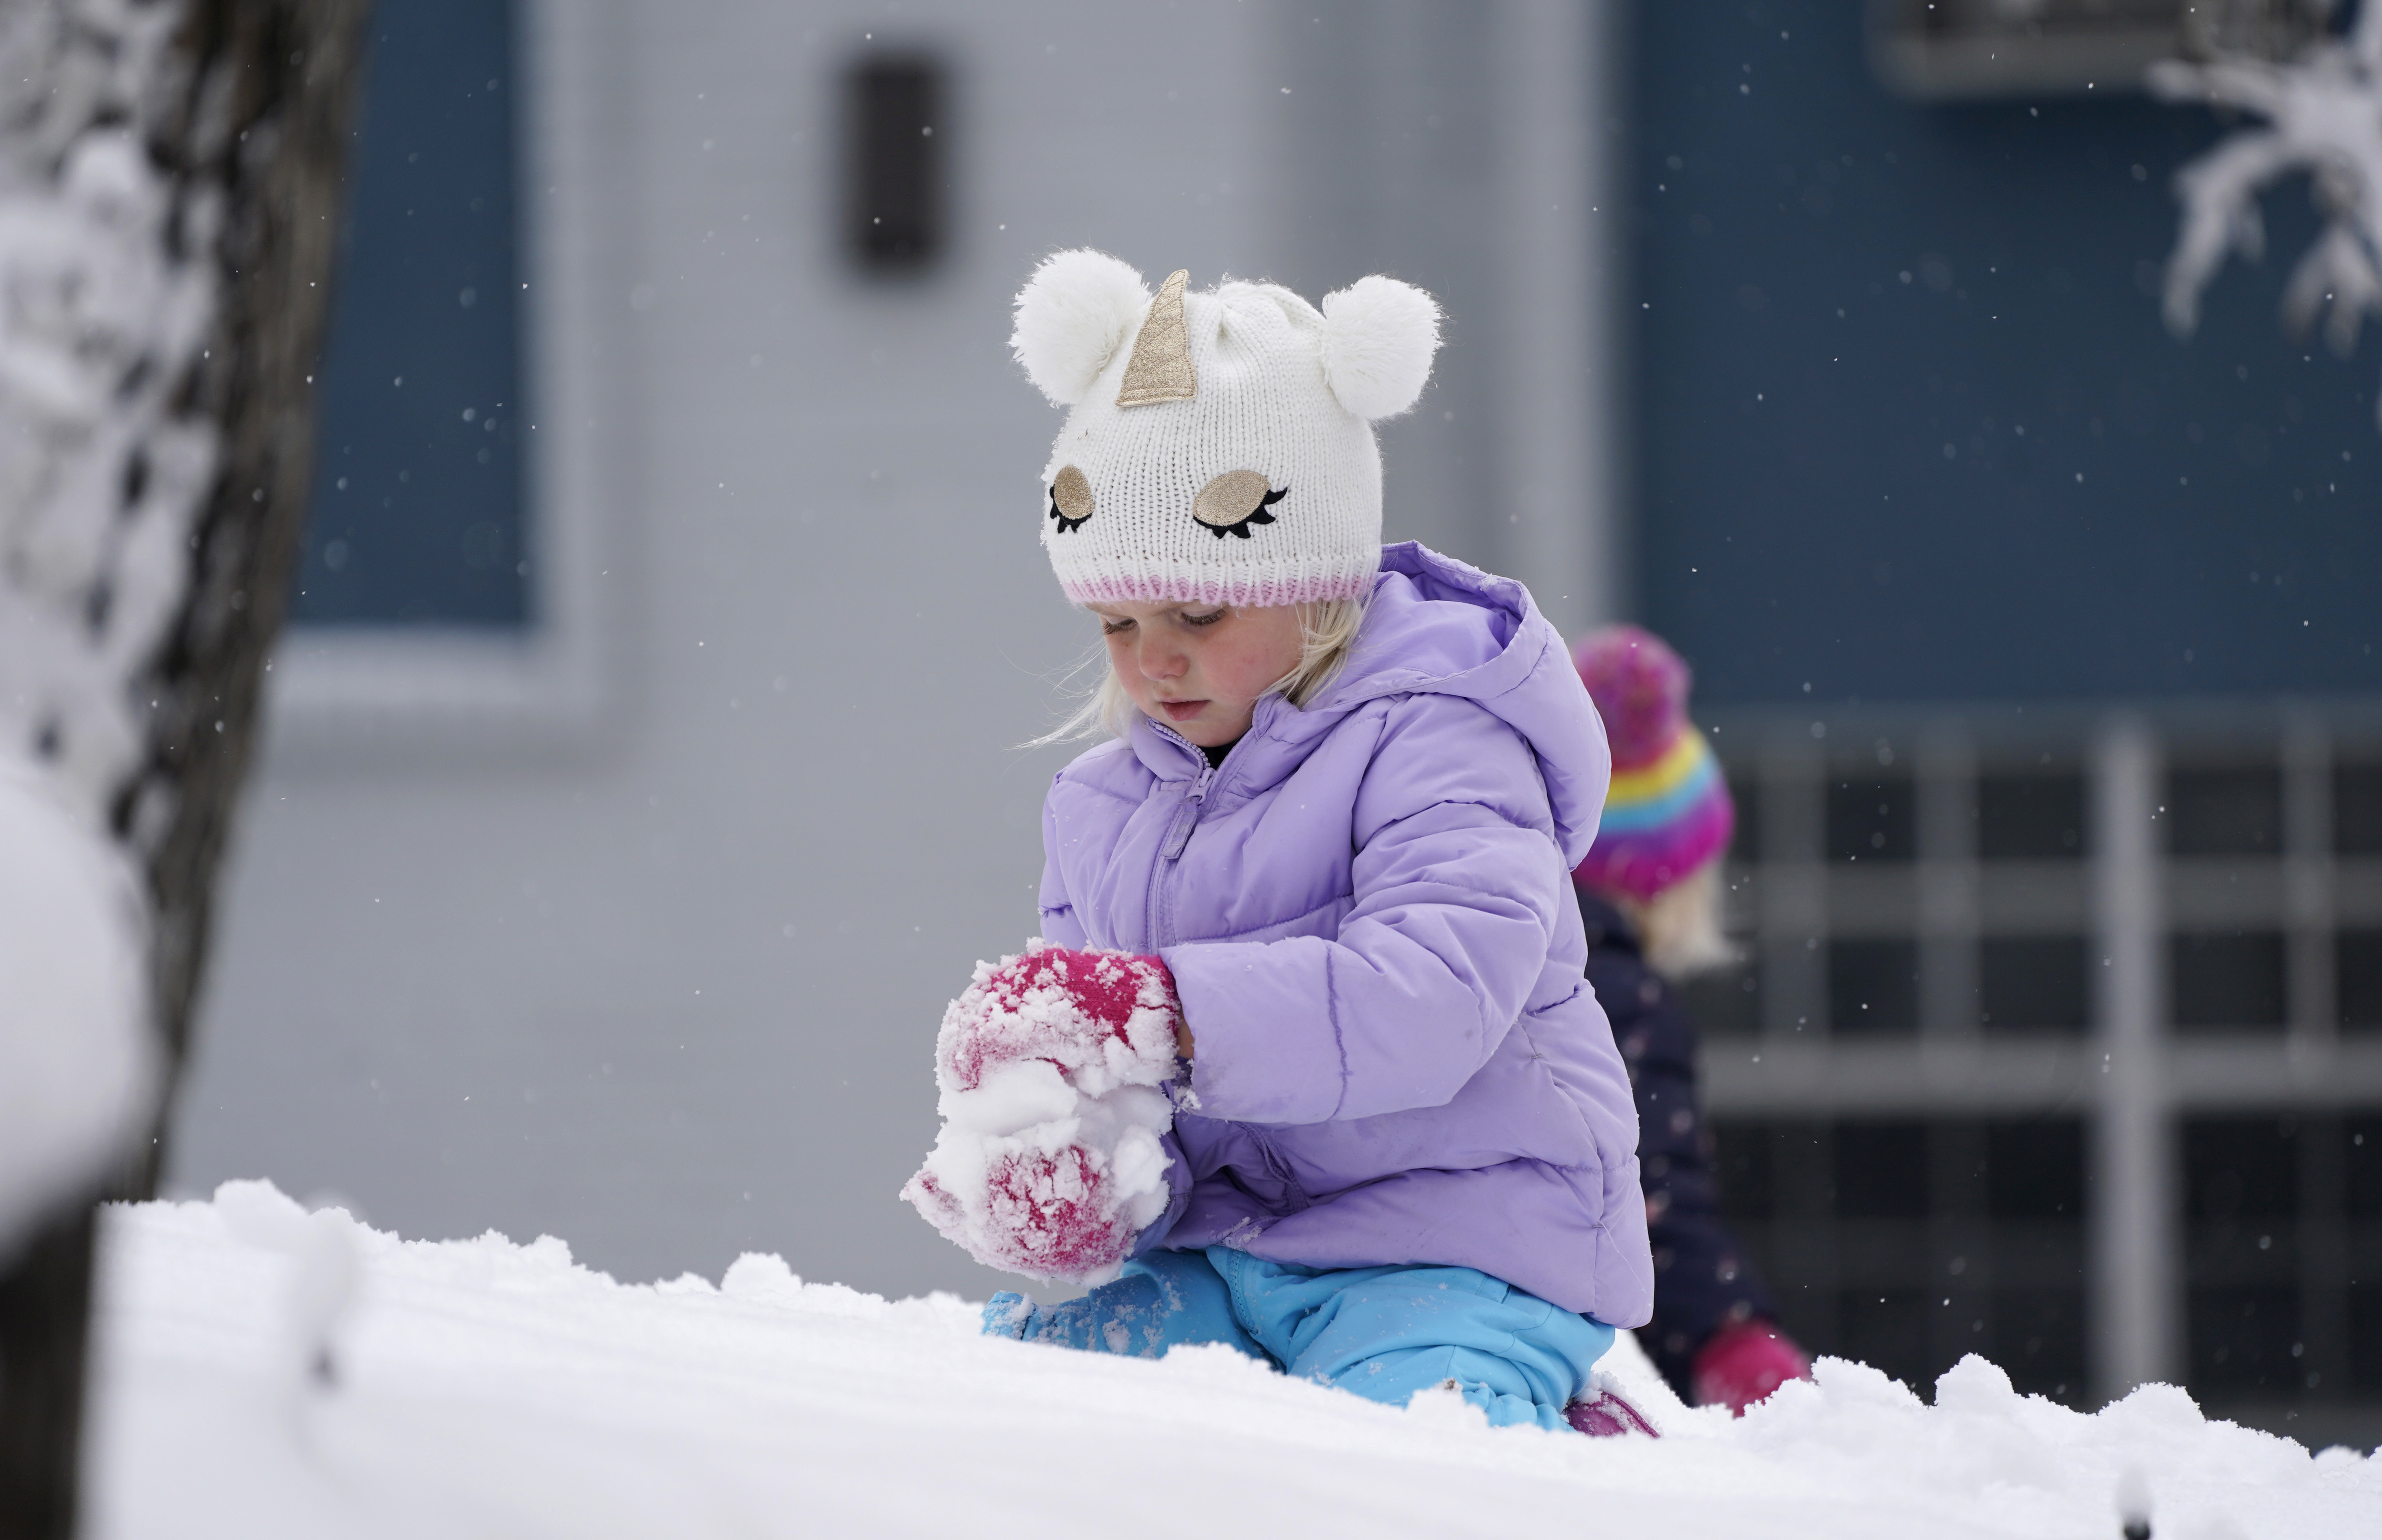 Snow totals for April 15-16, 2021, Colorado snowstorm